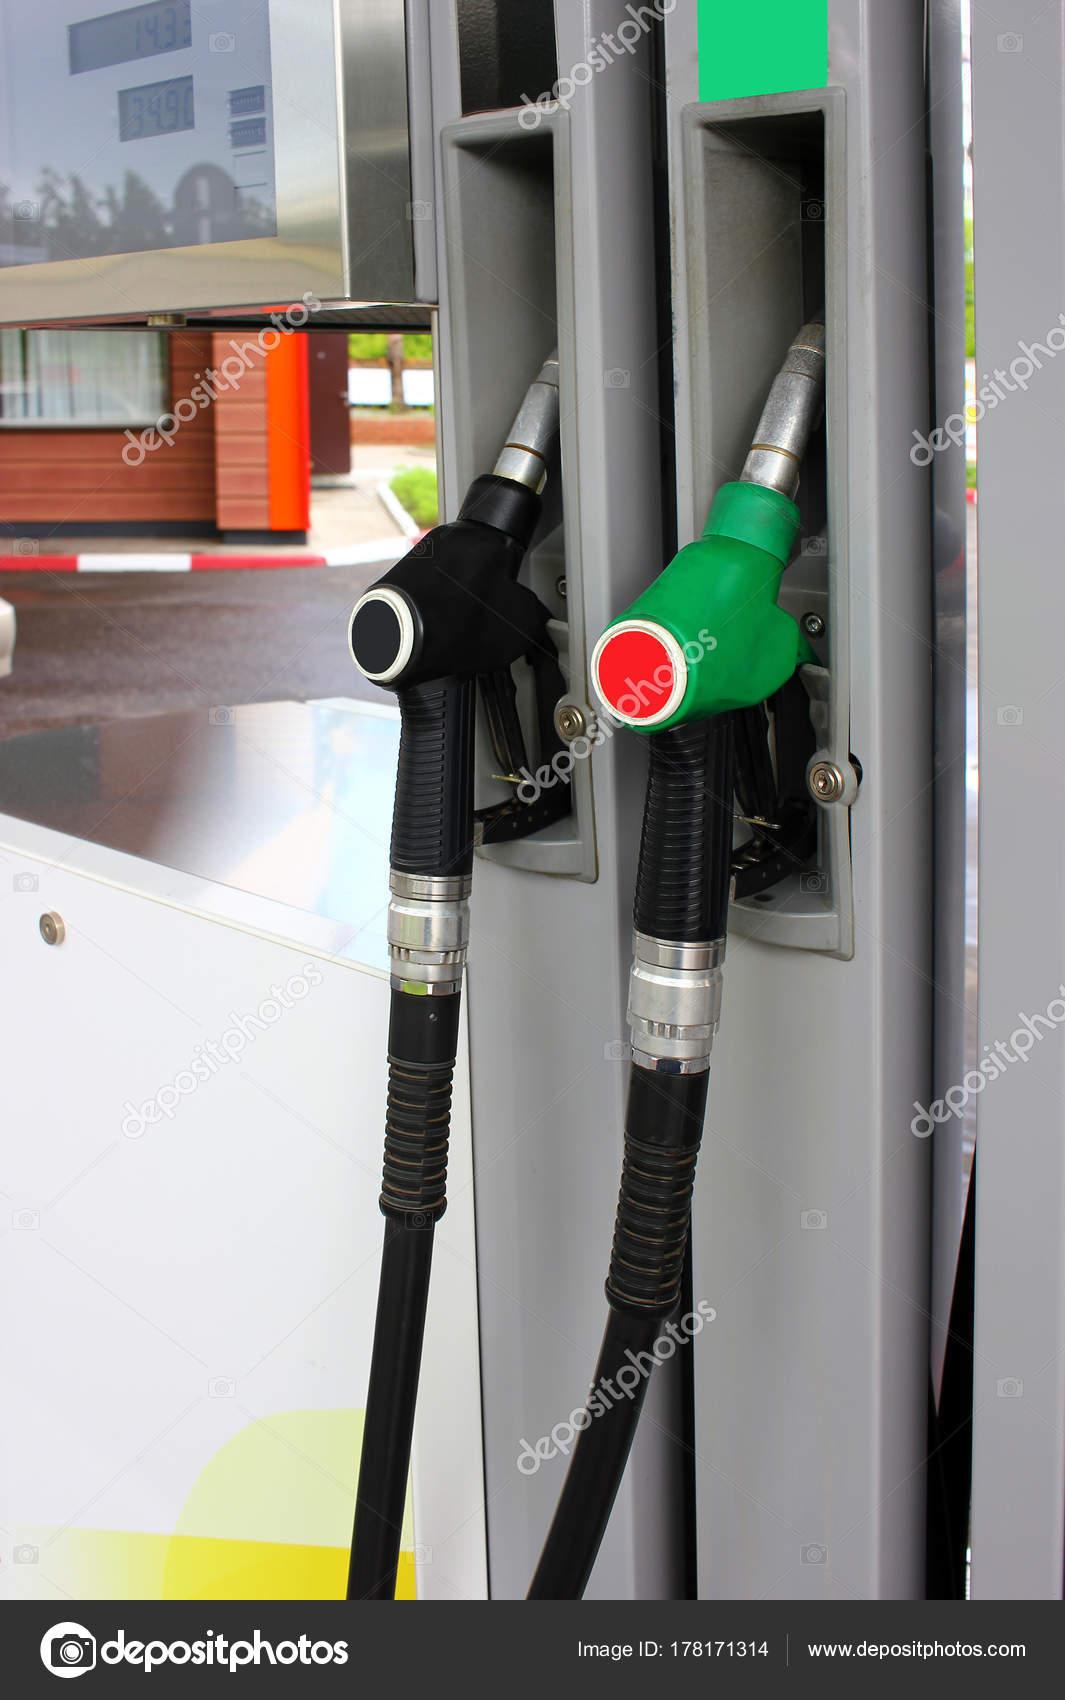 Diesel Fuel Station >> Gasoline Diesel Fuel Pump Nozzles Gas Station Source Energy